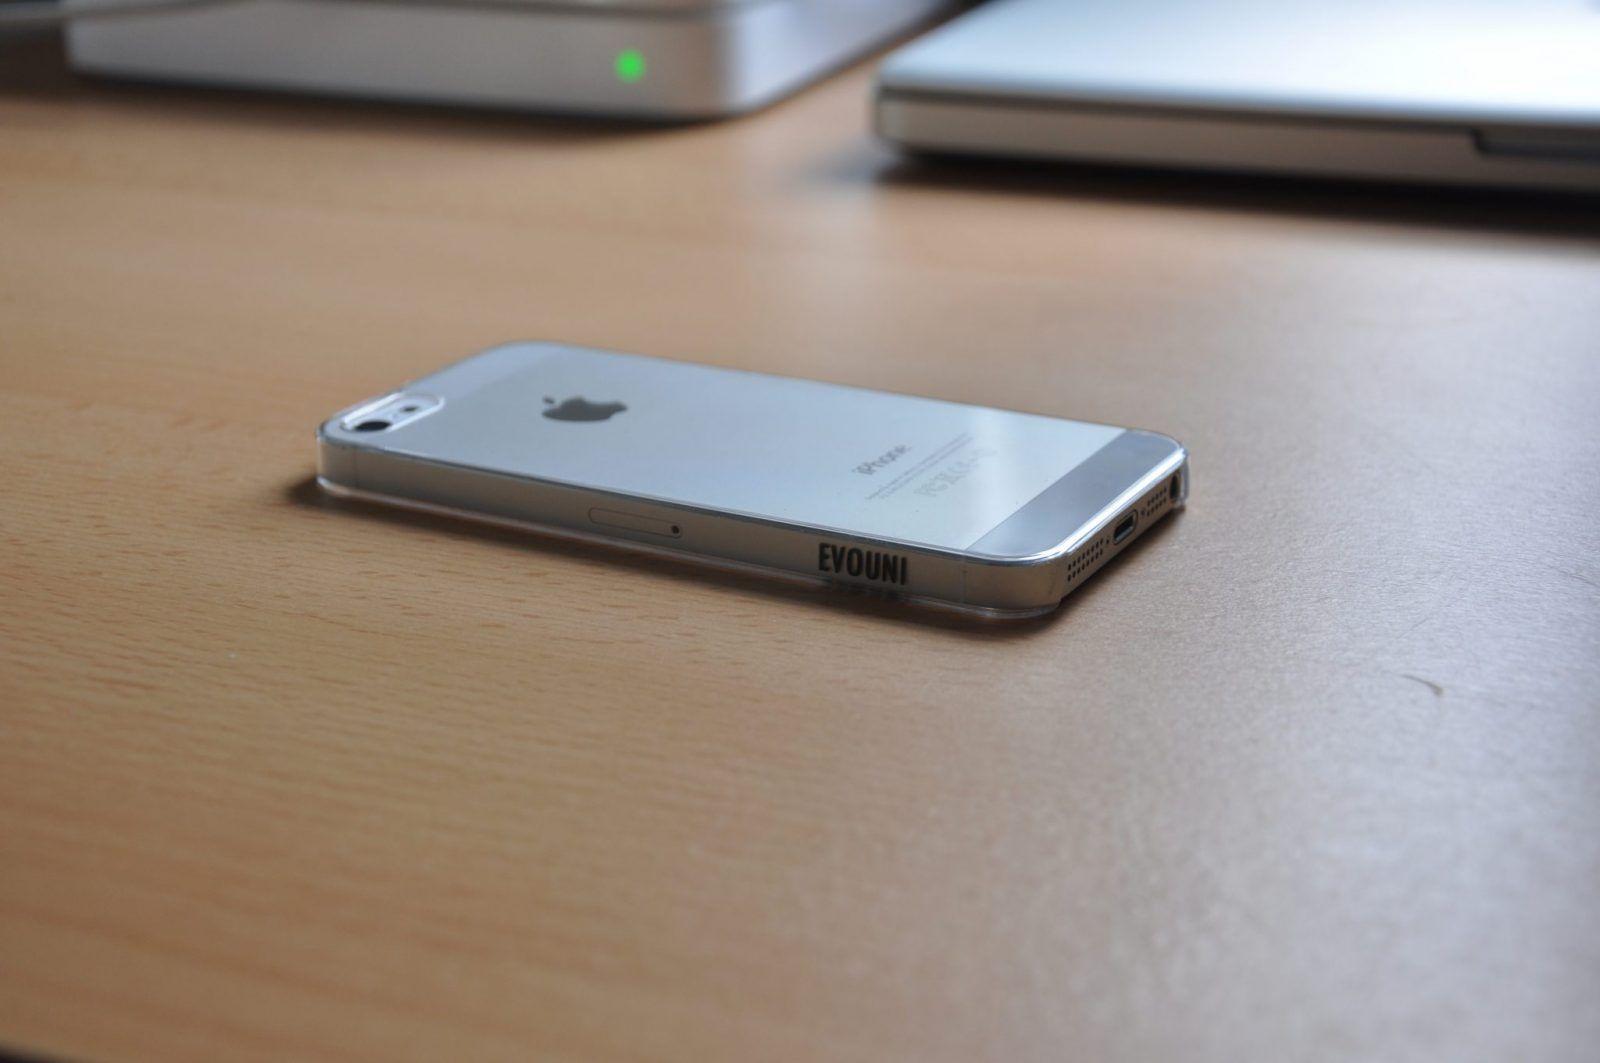 Recenzja EVOUNI Crystal Case Ultrathin S25 – super cienka obudowa dla iPhone'a 5